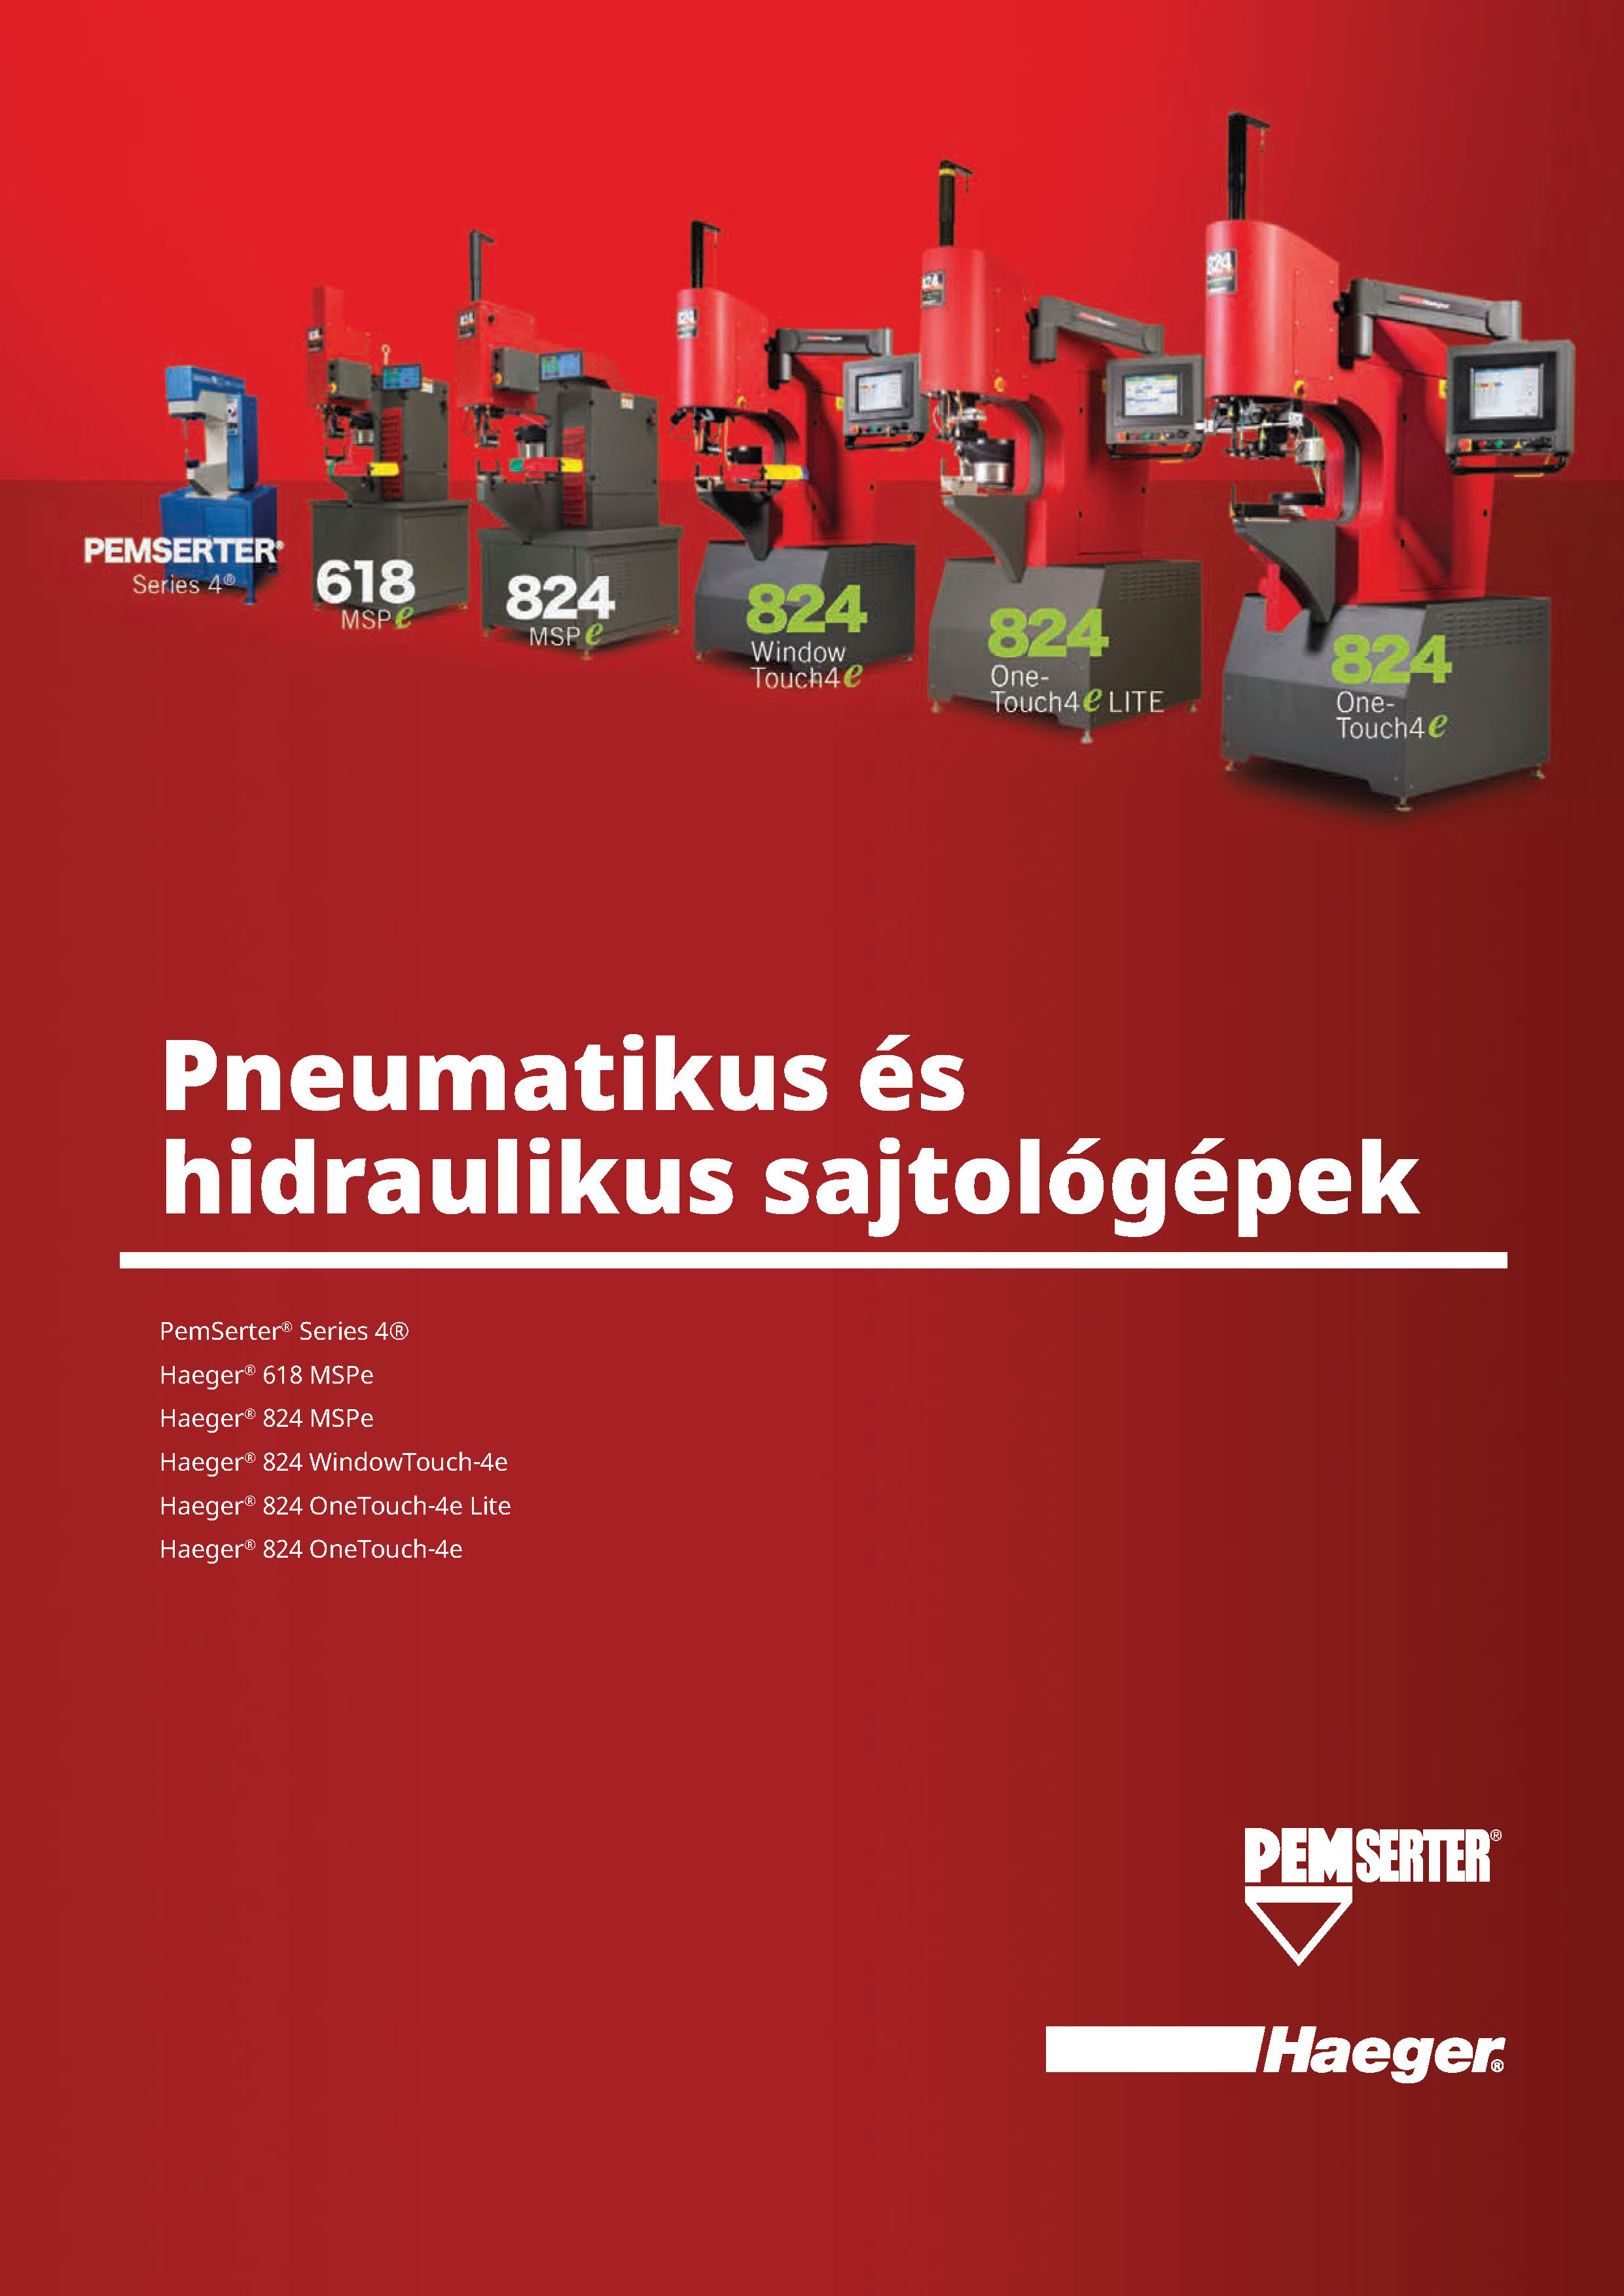 Pneumatikus és hidraulikus sajtológépek